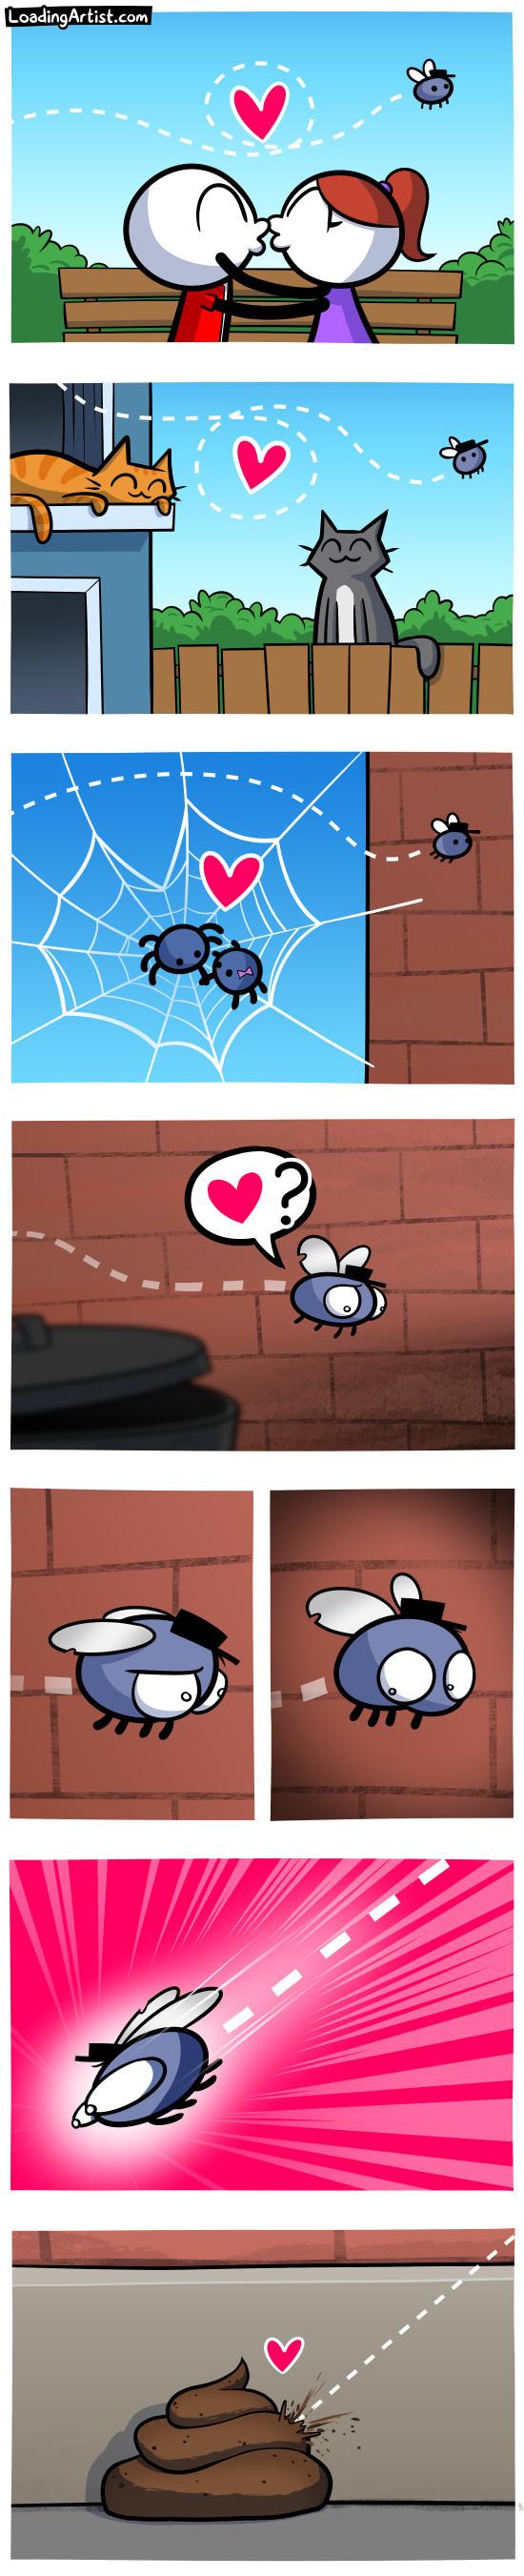 Flying Solo. www.loadingartist.com/comic/flying-solo.. His waifu is literally . Flying Solo www loadingartist com/comic/flying-solo His waifu is literally